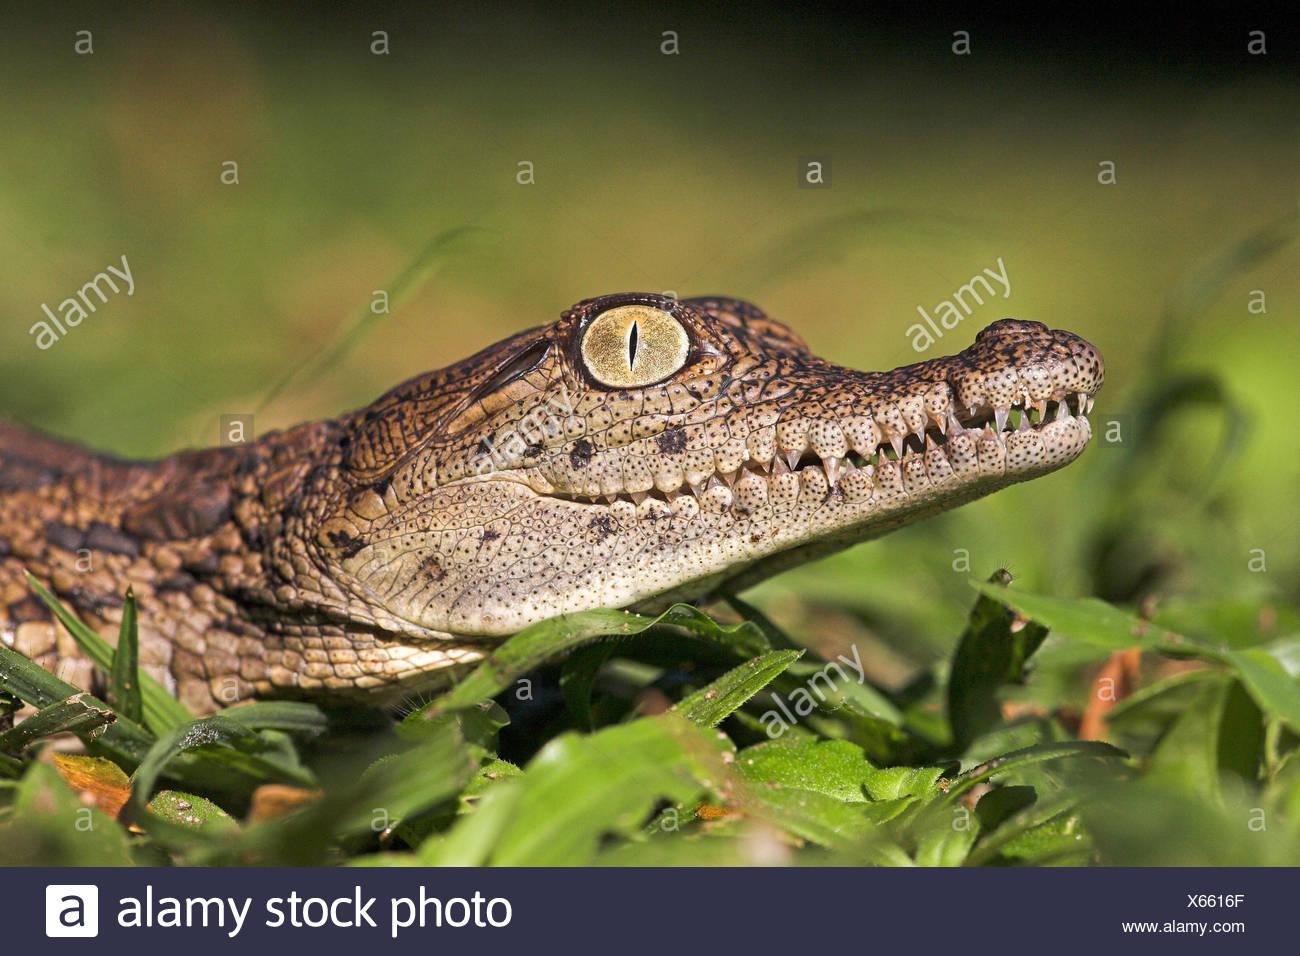 Portrait of a nile crocodile hatchling - Stock Image